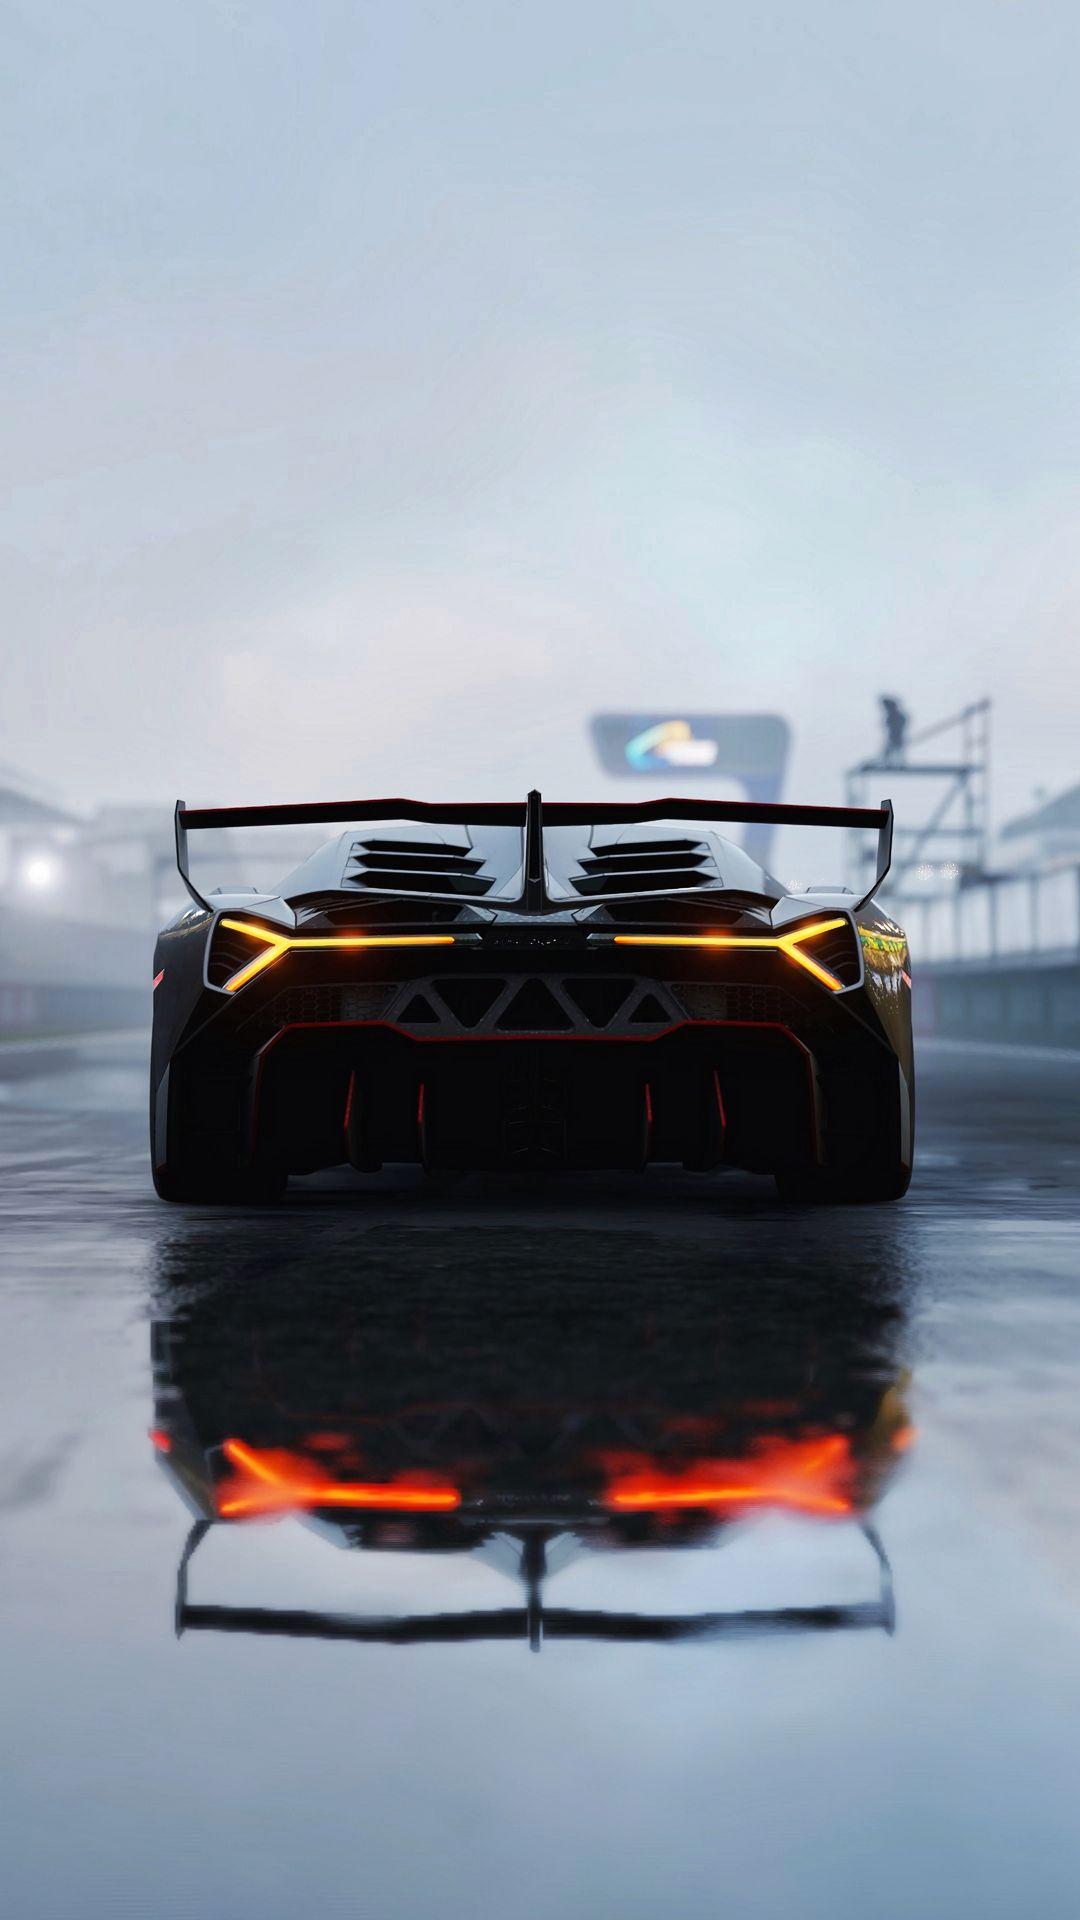 Lamborghini Veno Wallpapers Free Download